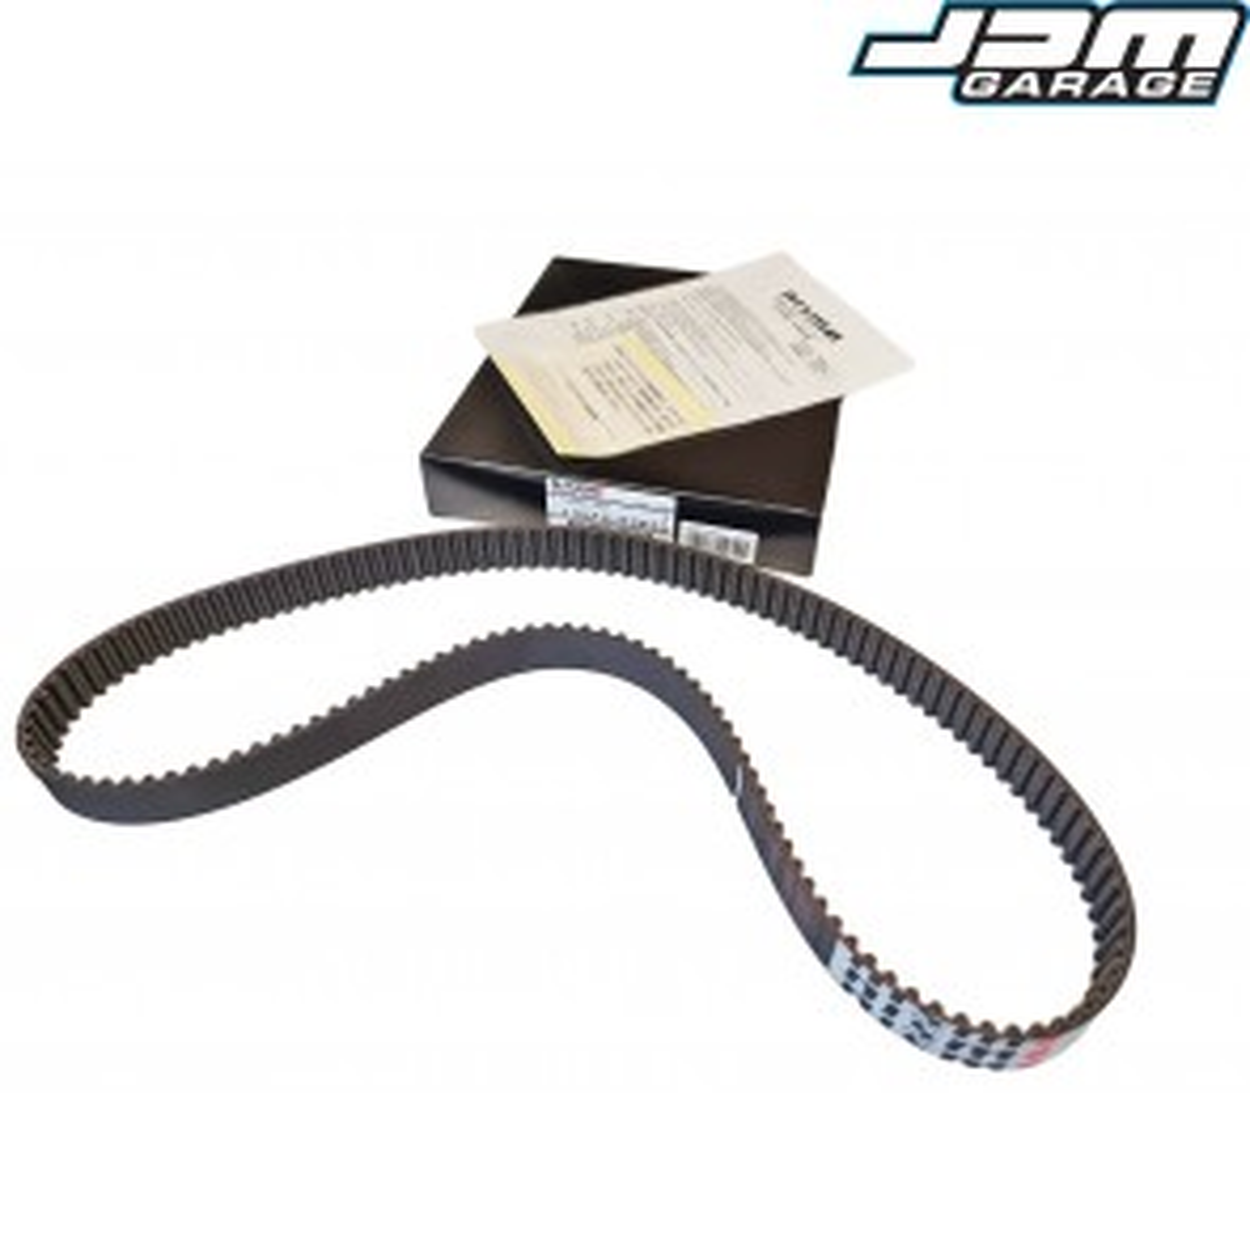 Genuine Nismo Reinforced RB Timing Belt For Nissan Skyline R32 R33 GTST R34 GTT GTR Stagea Laurel Cefiro Cedric Fairlady Z RB20 RB25 RB26